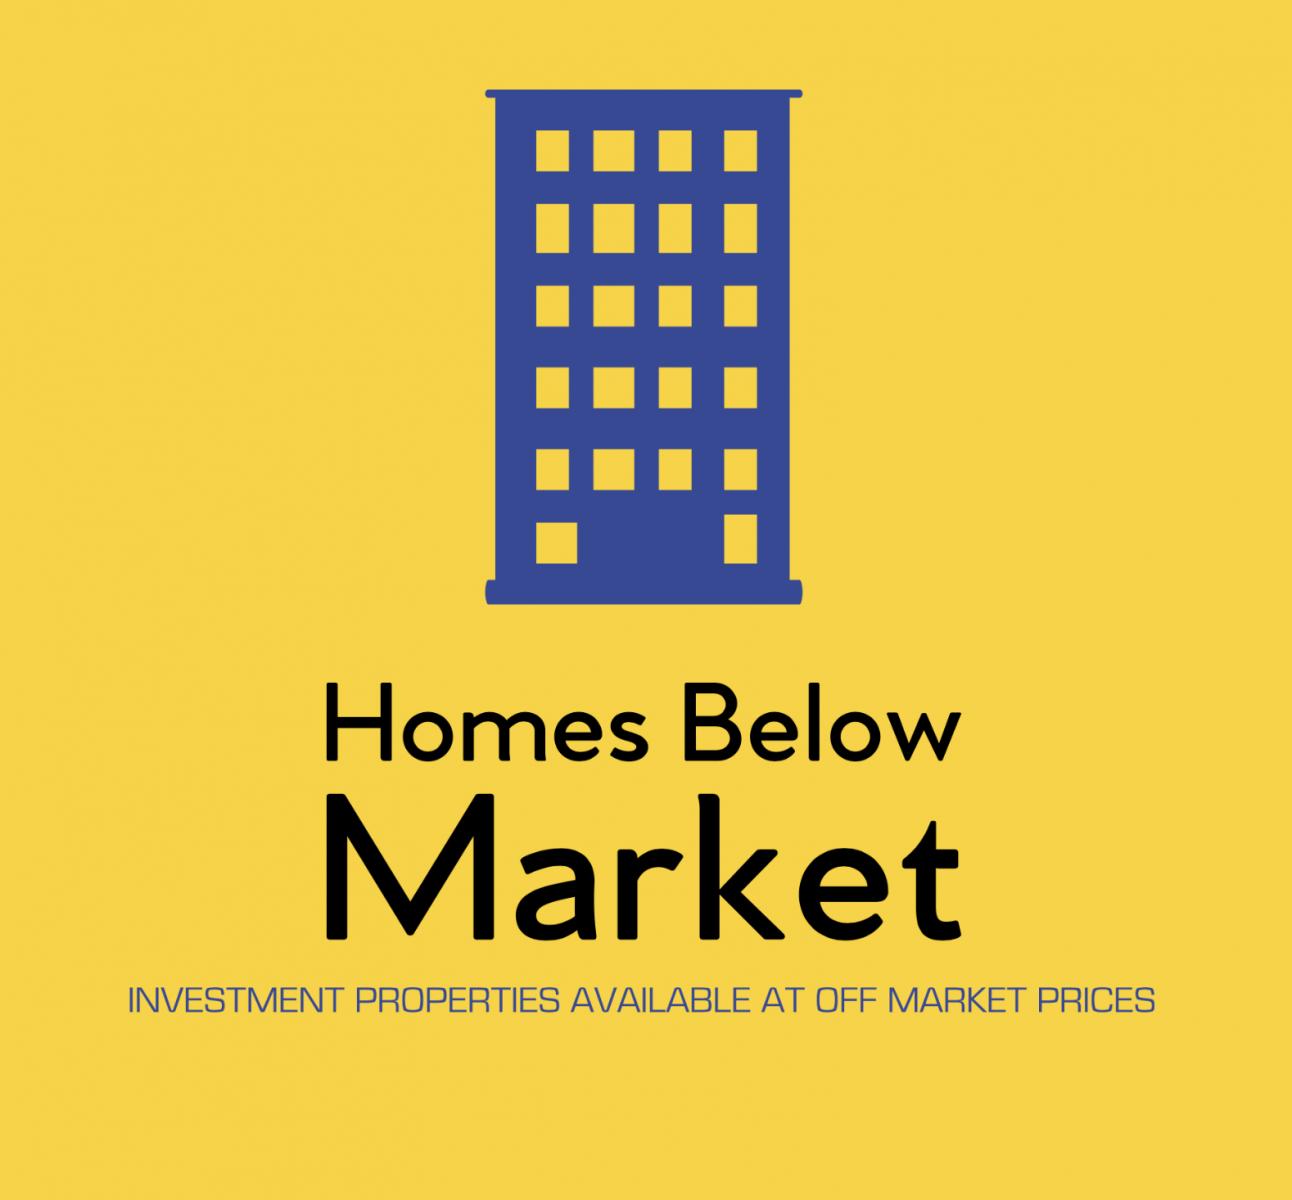 Homes Below Market logo